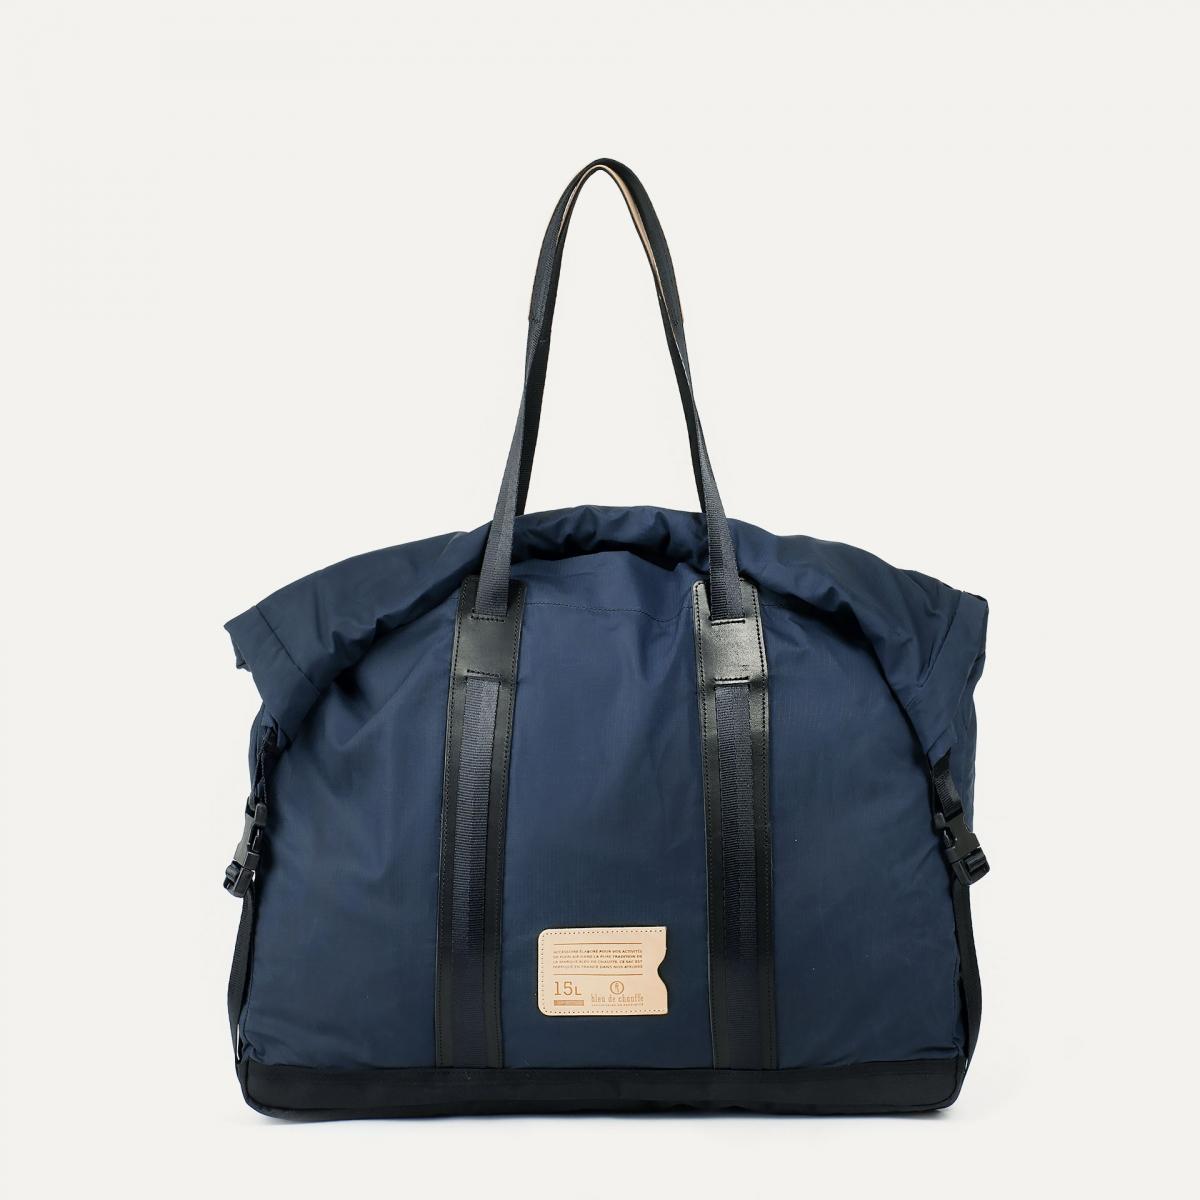 15L Barda Tote bag - Hague Blue (image n°1)